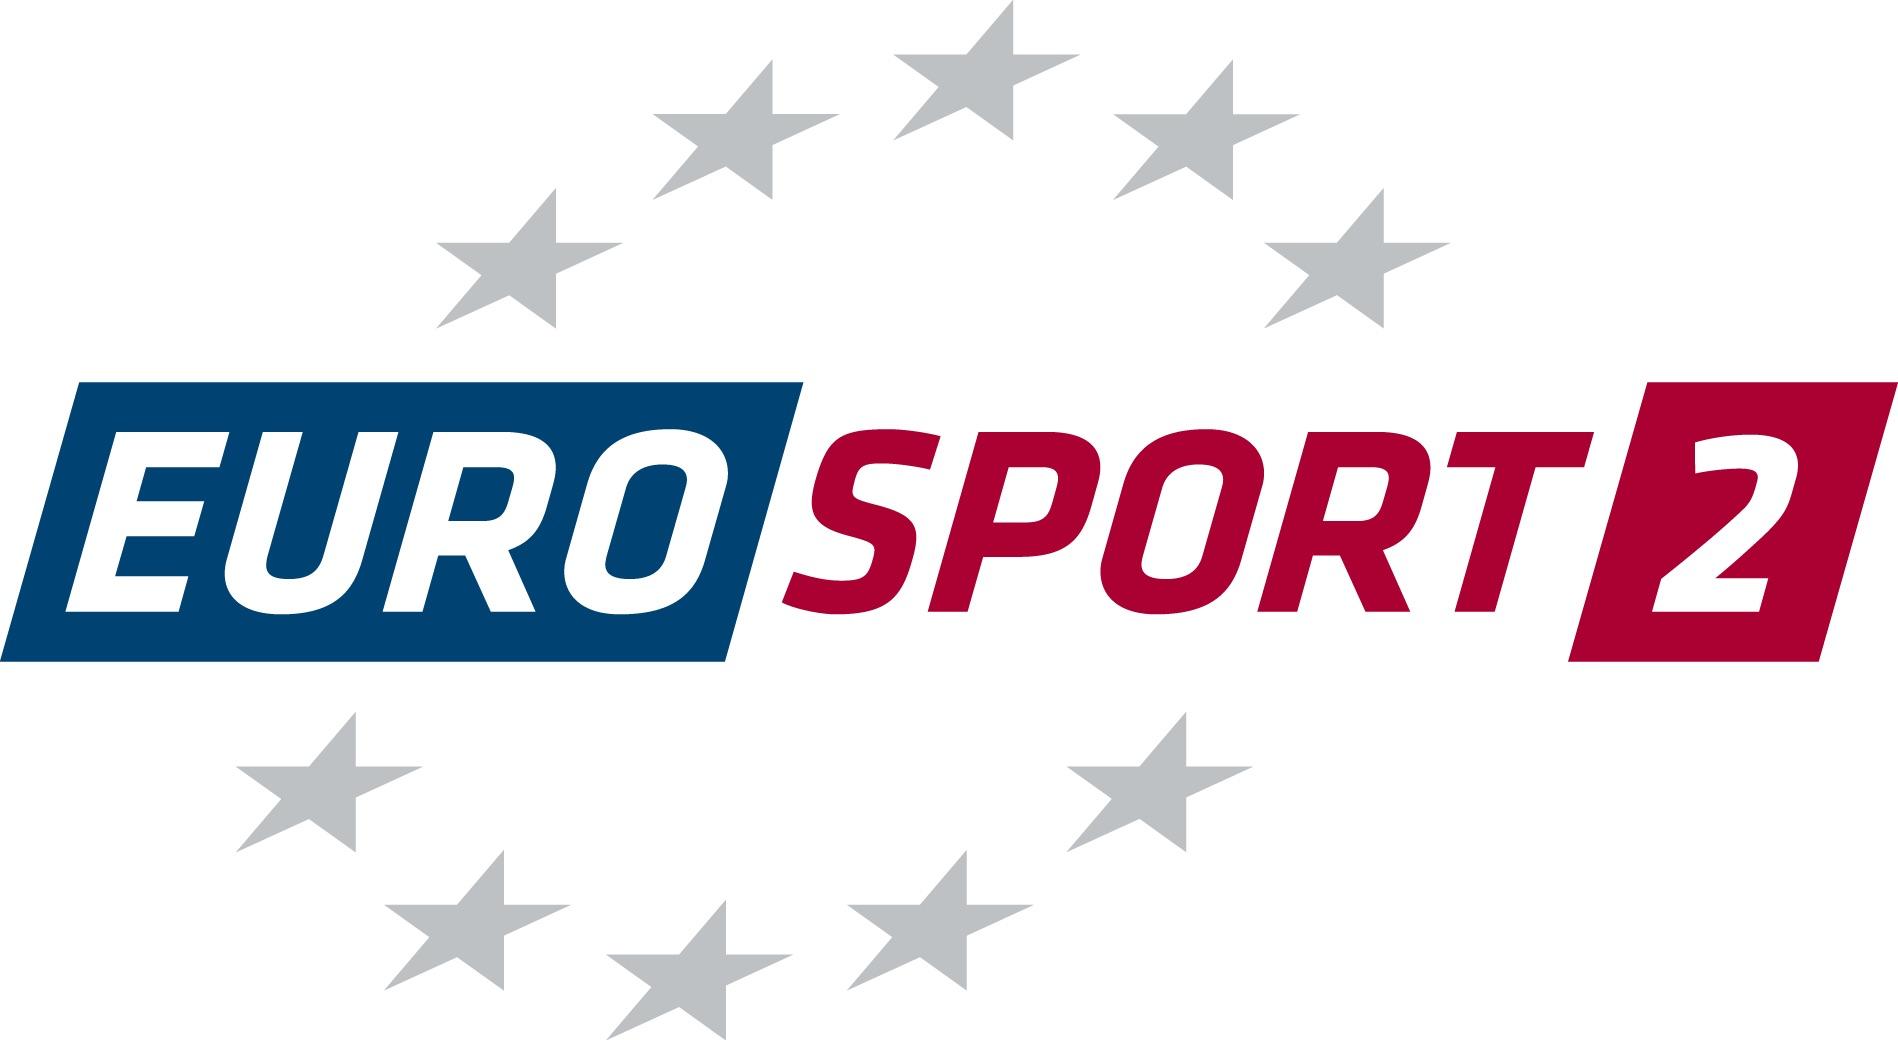 Eurosport 2 will broadcast the historic Europe vs Japan Baseball Series ©Eurosport 2